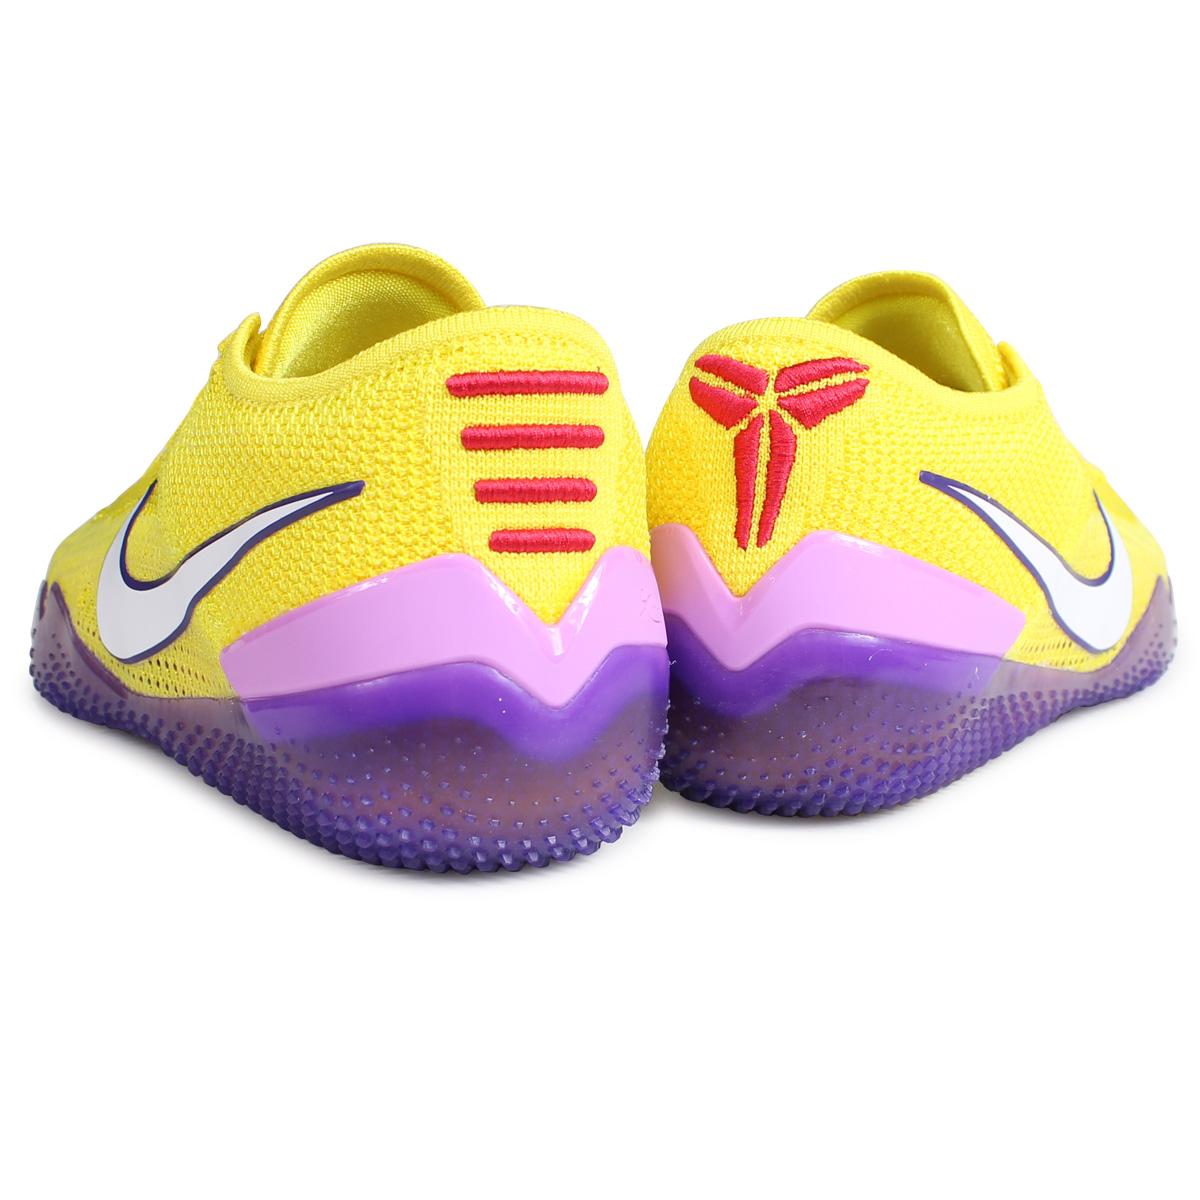 b56575f5377 NIKE KOBE AD NXT 360 YELLOW STRIKE Nike Corby sneakers men AQ1087-700 yellow   187